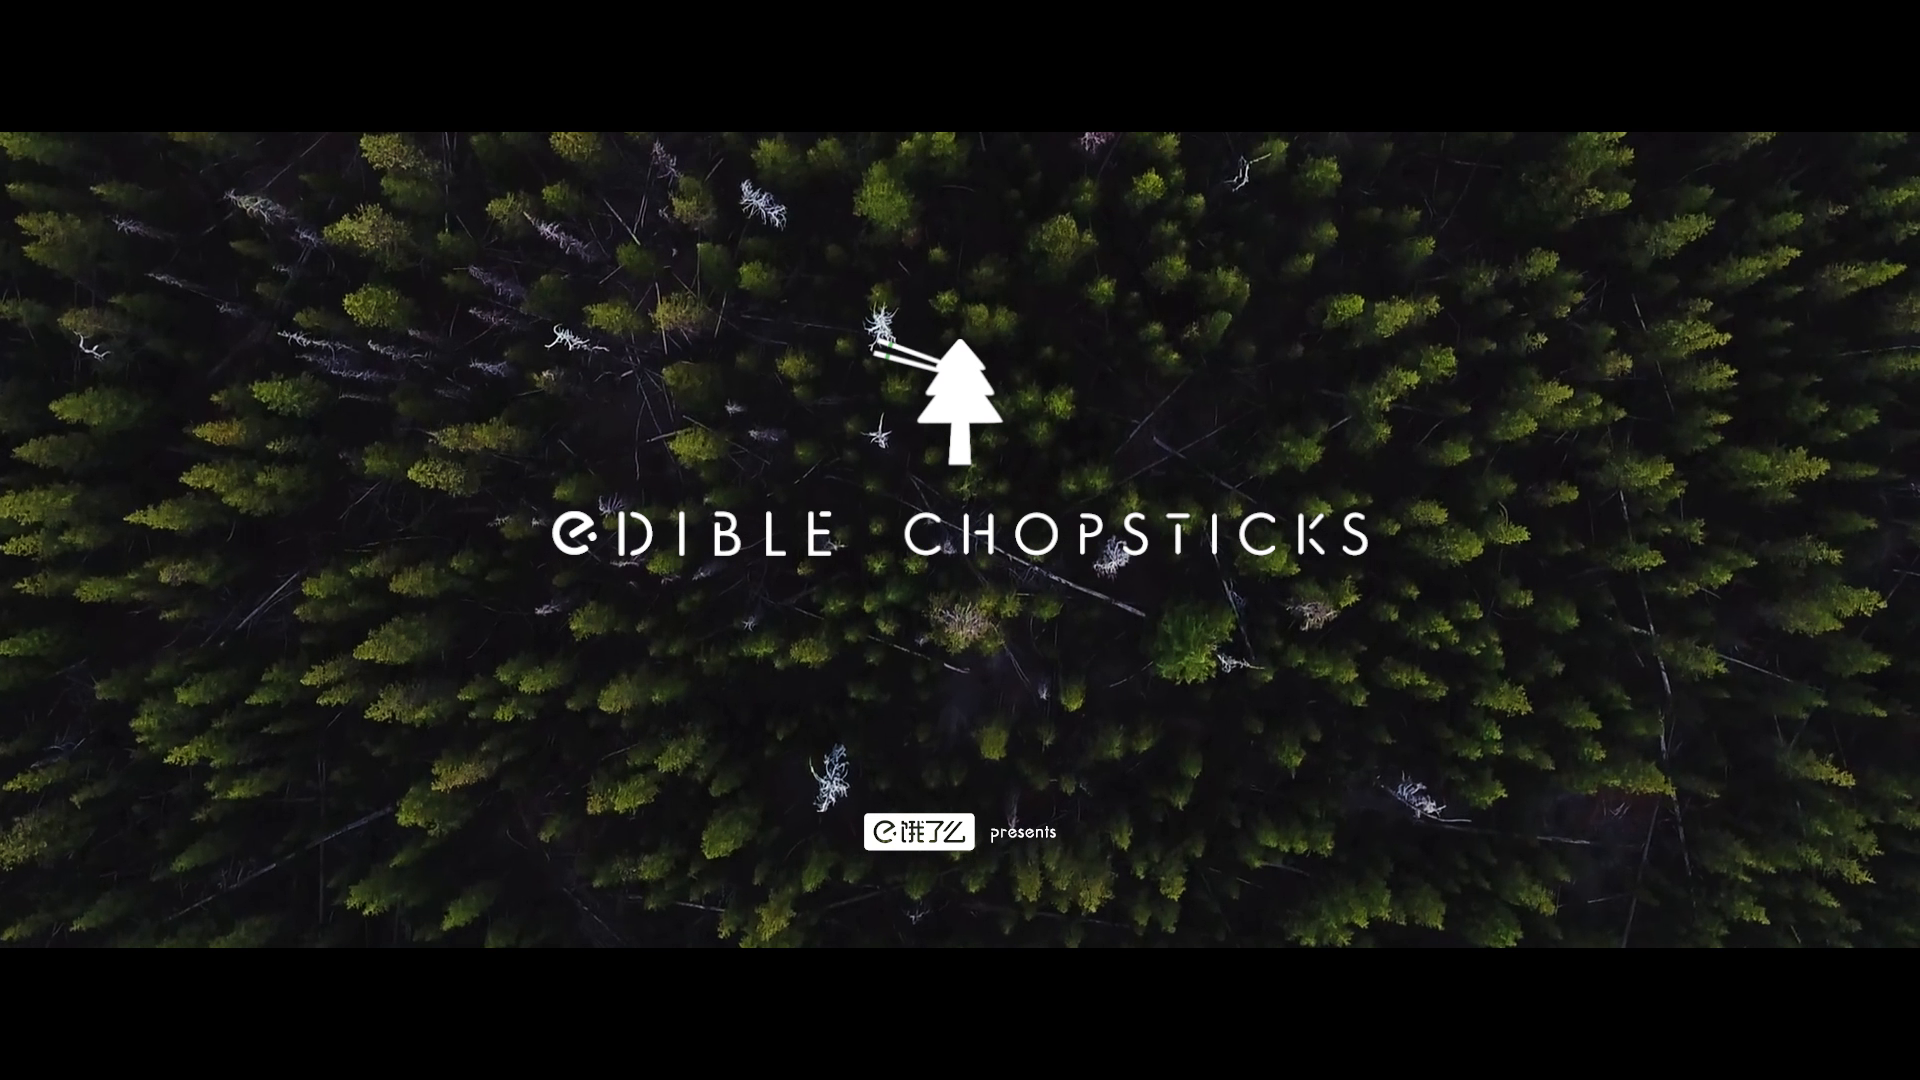 Thumbnail for Edible Chopsticks